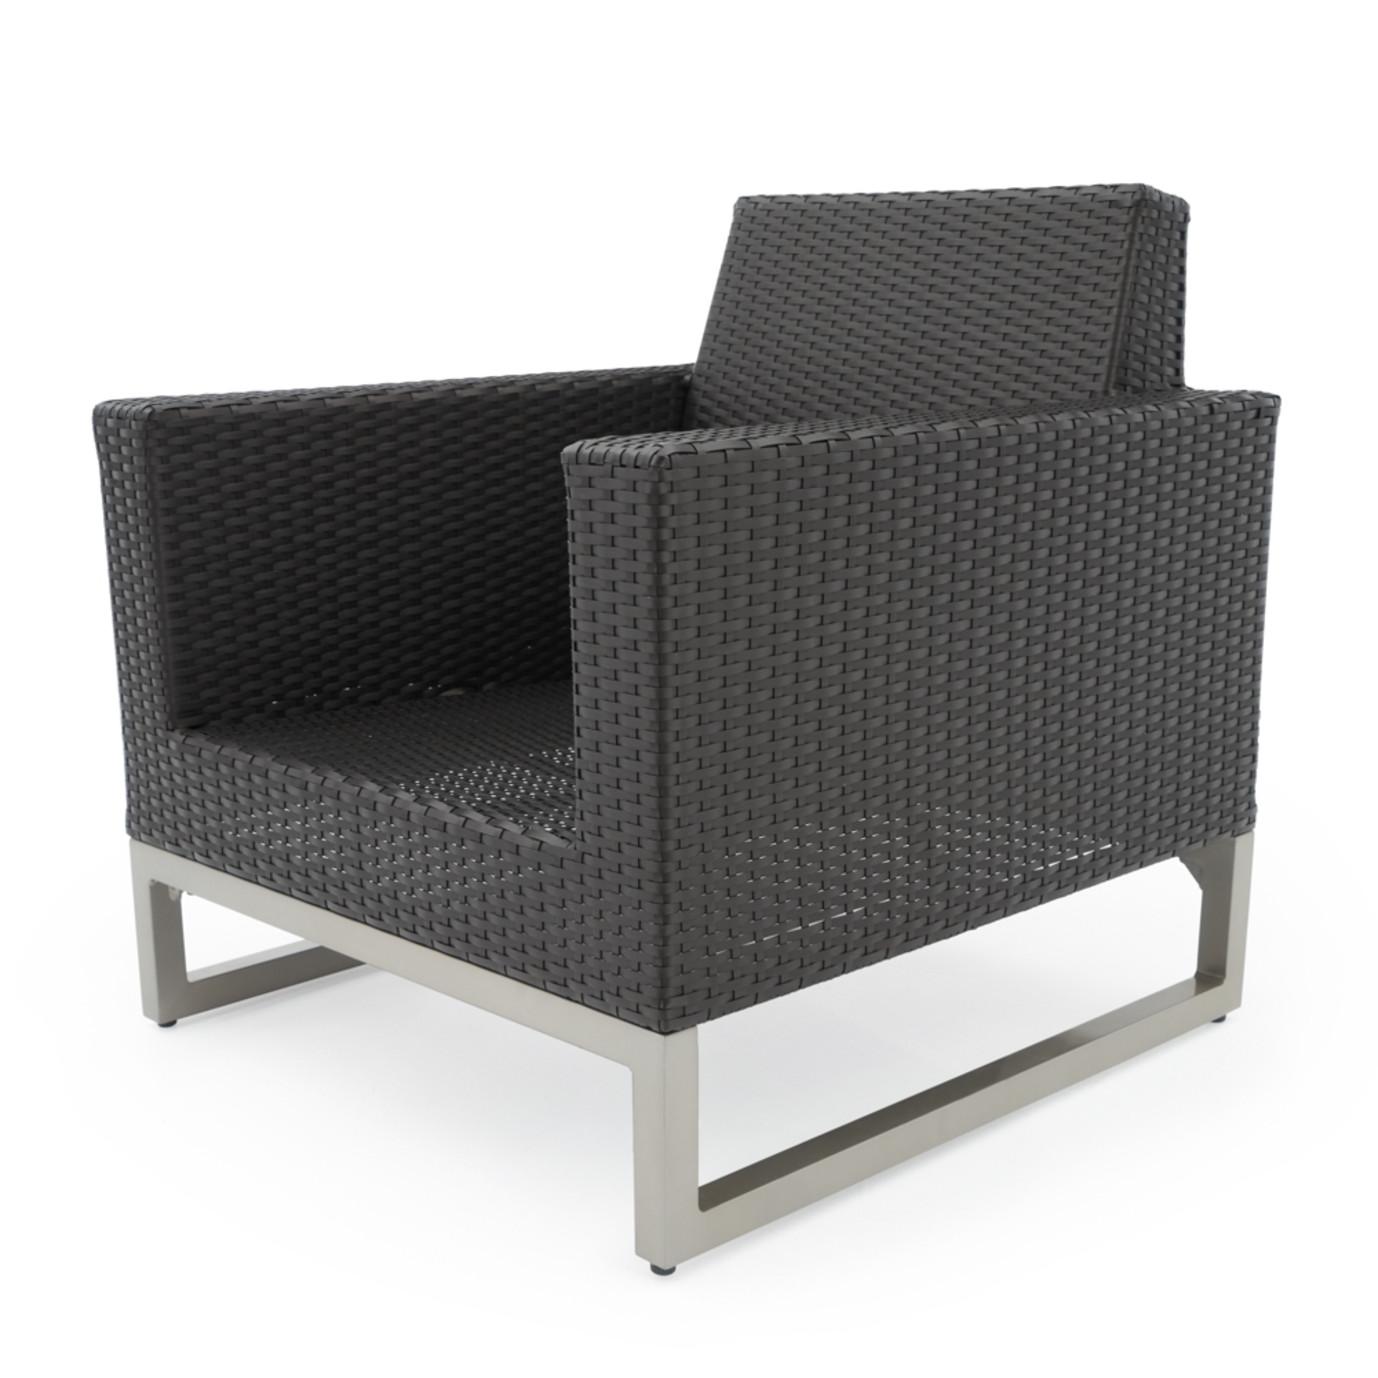 Milo™ Espresso 7pc Deep Seating Set - Charcoal Gray